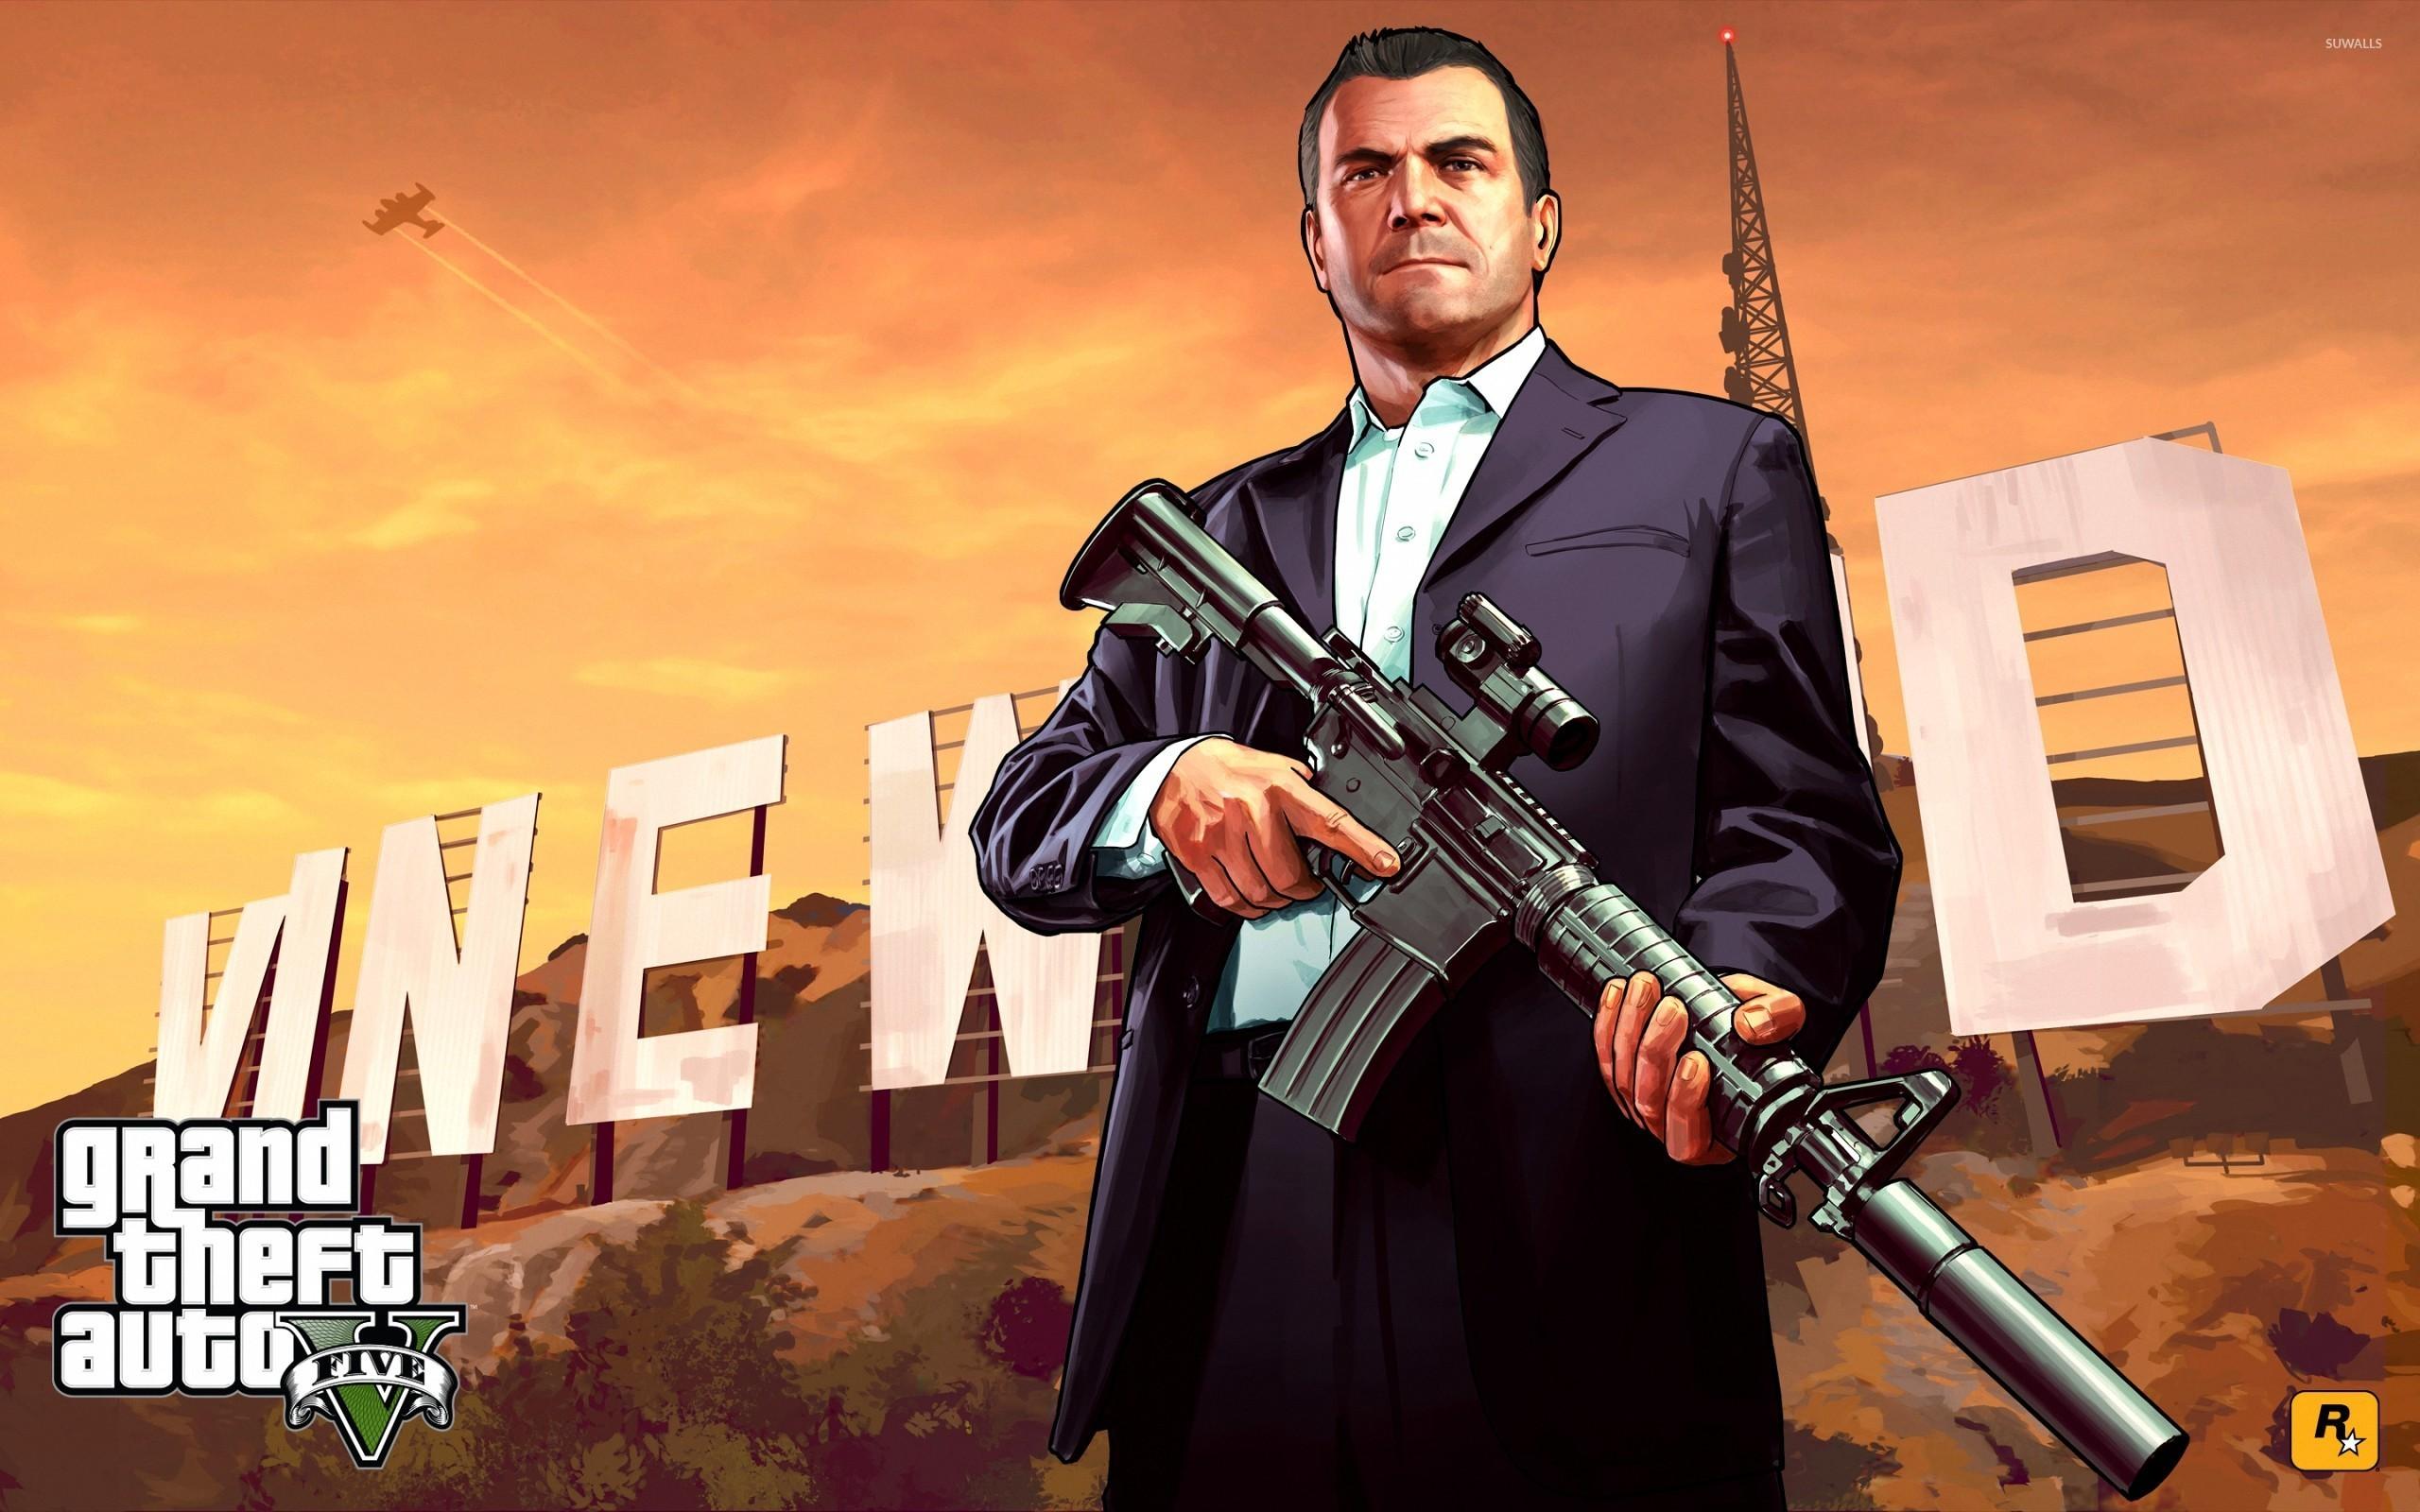 Michael - Grand Theft Auto V [2] wallpaper - Game ...